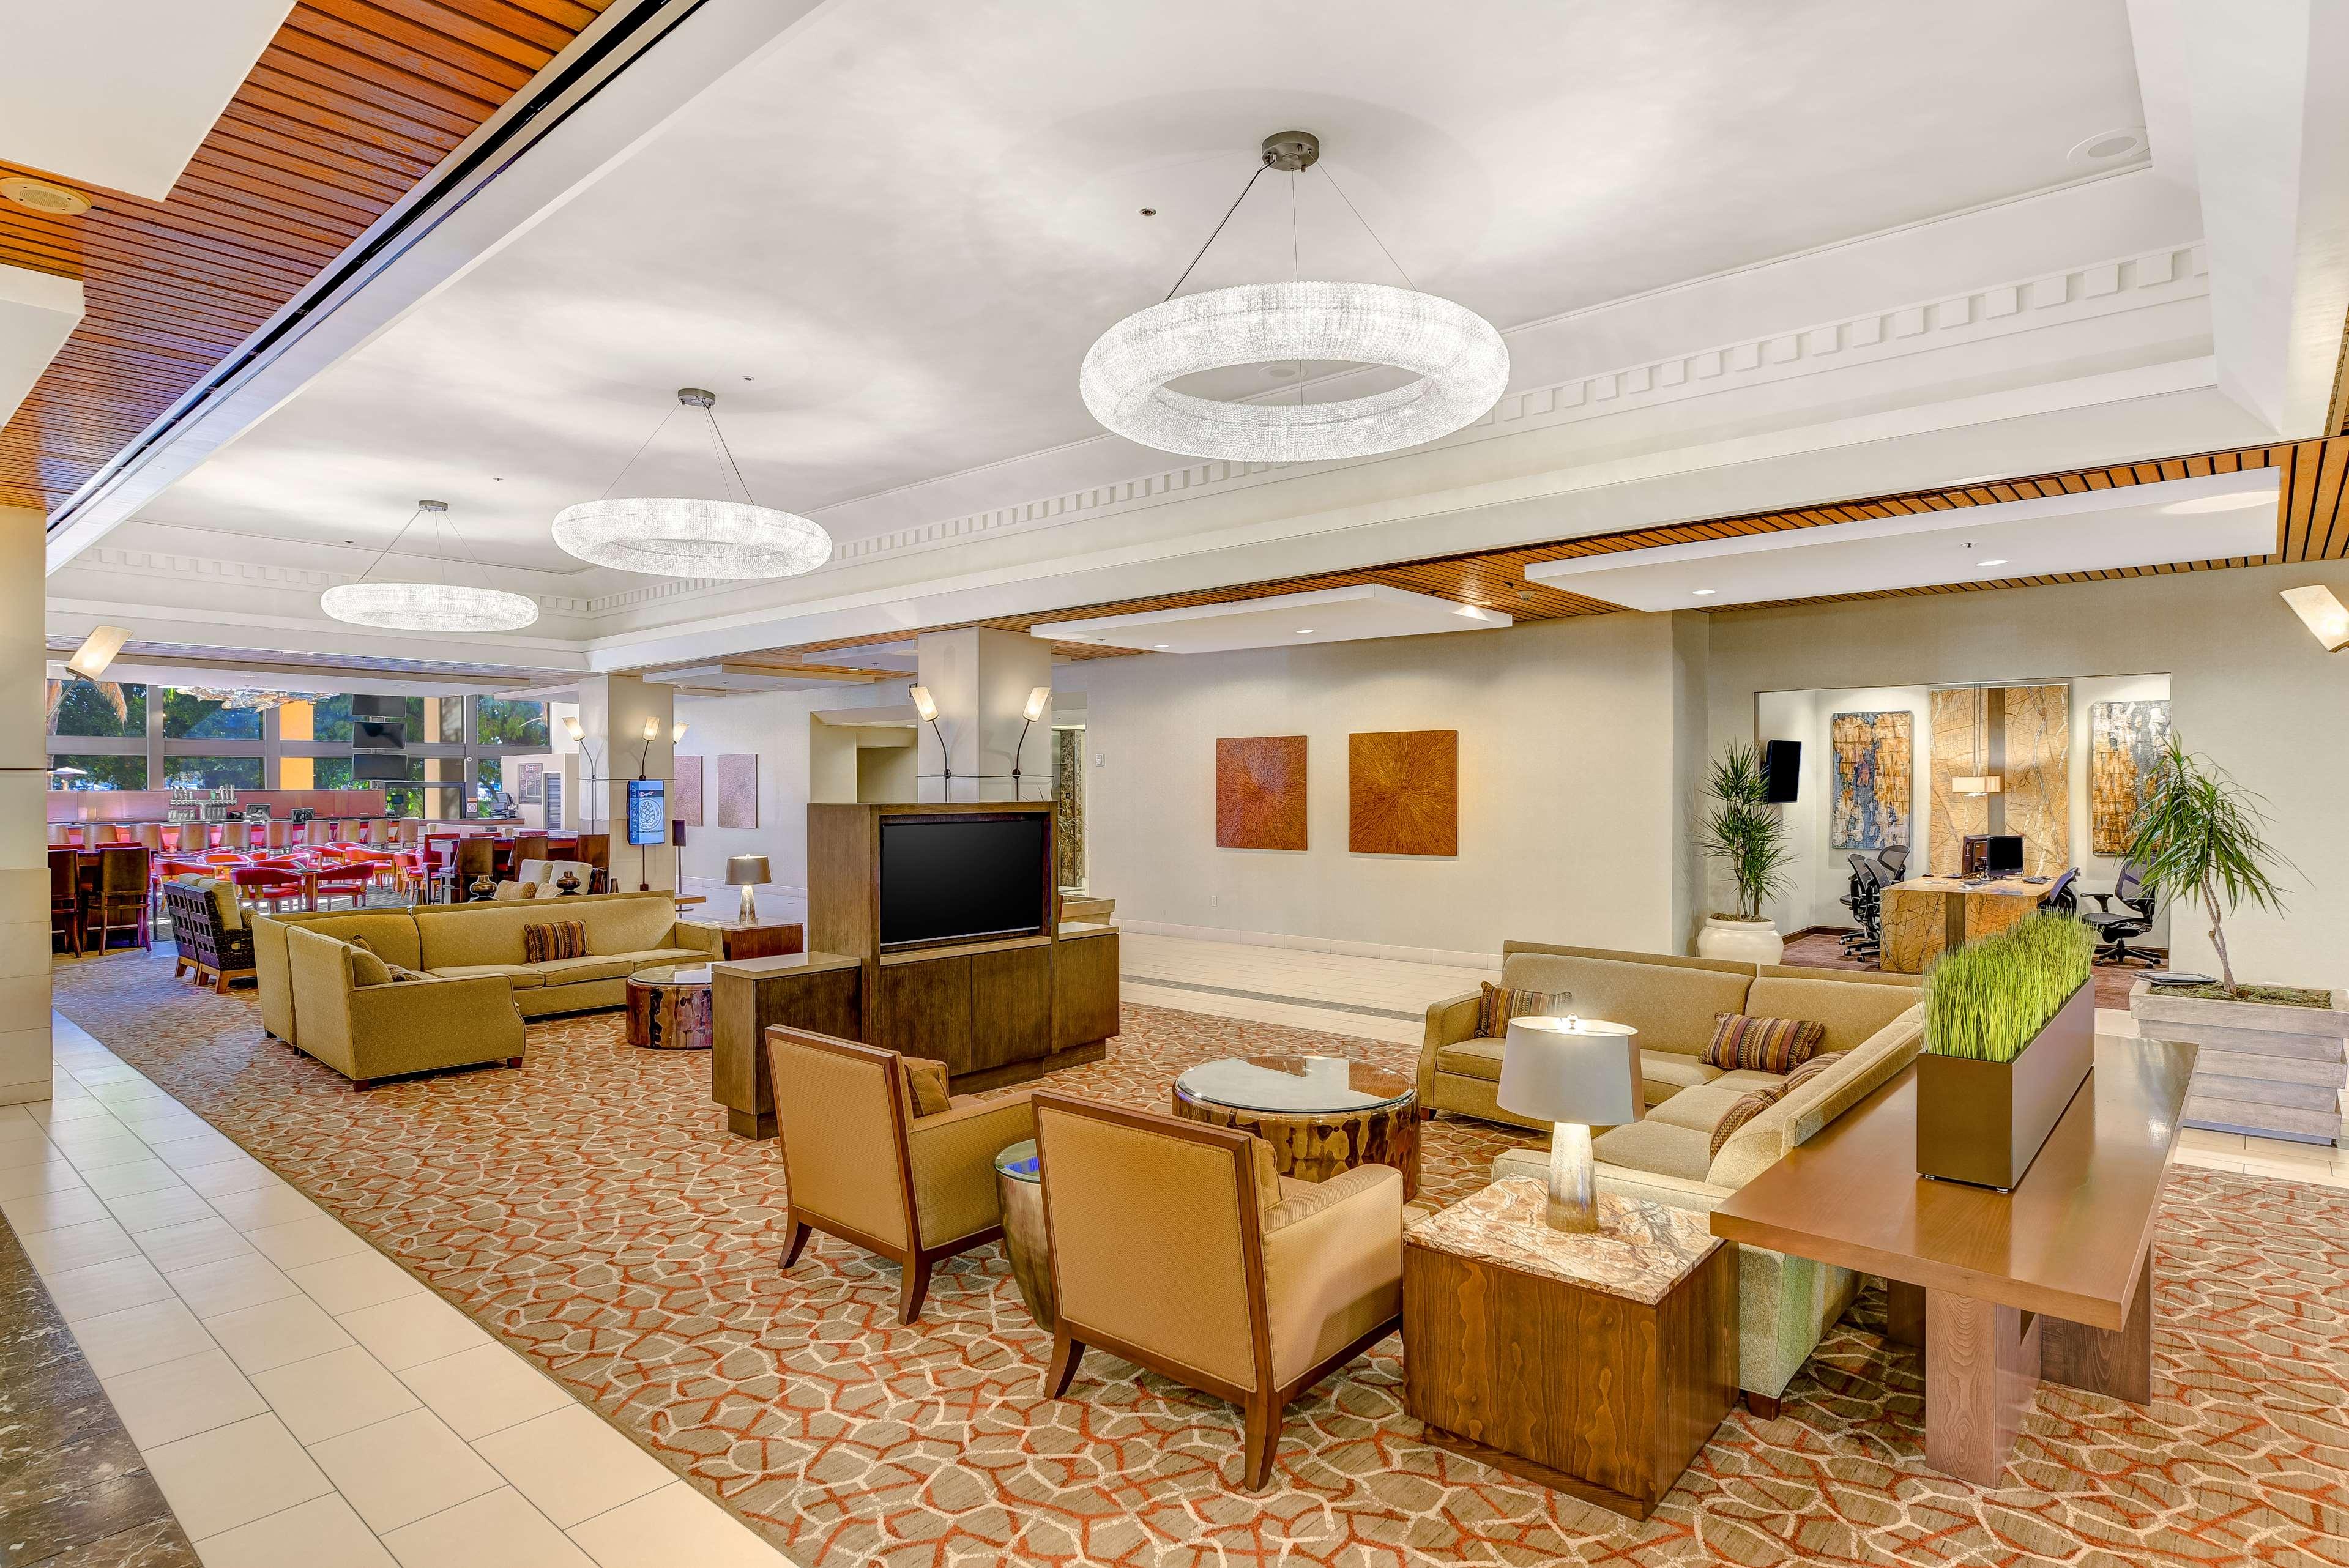 DoubleTree by Hilton Hotel Anaheim - Orange County image 14